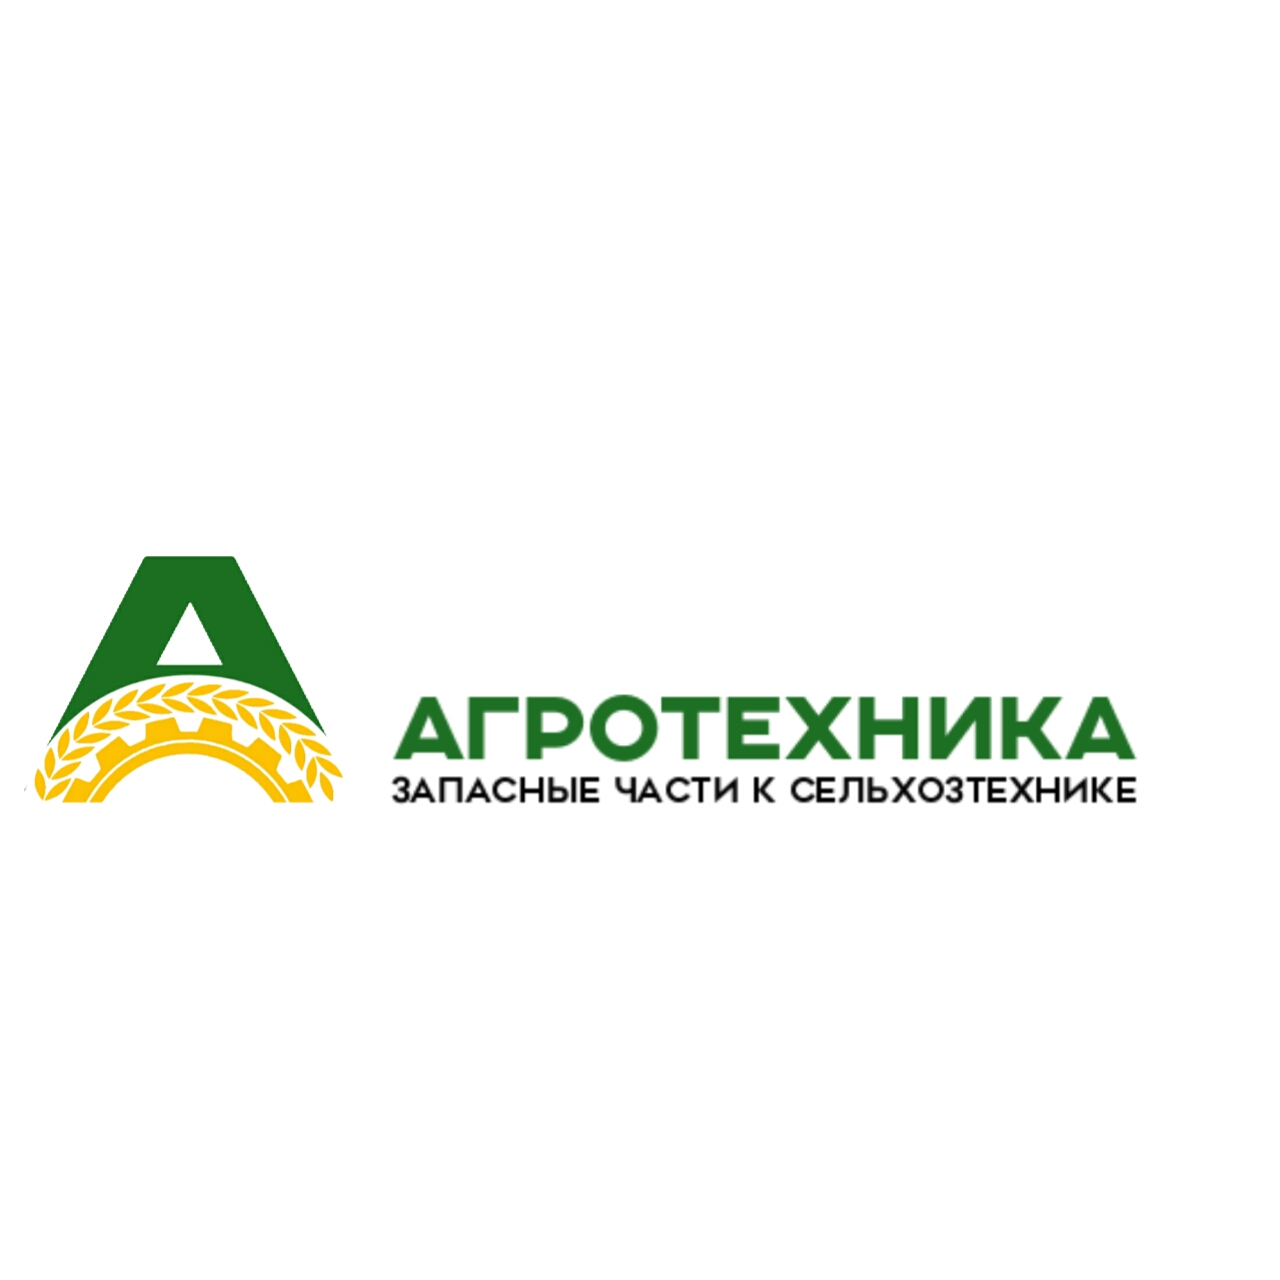 Разработка логотипа для компании Агротехника фото f_6855c002edc6d674.jpg